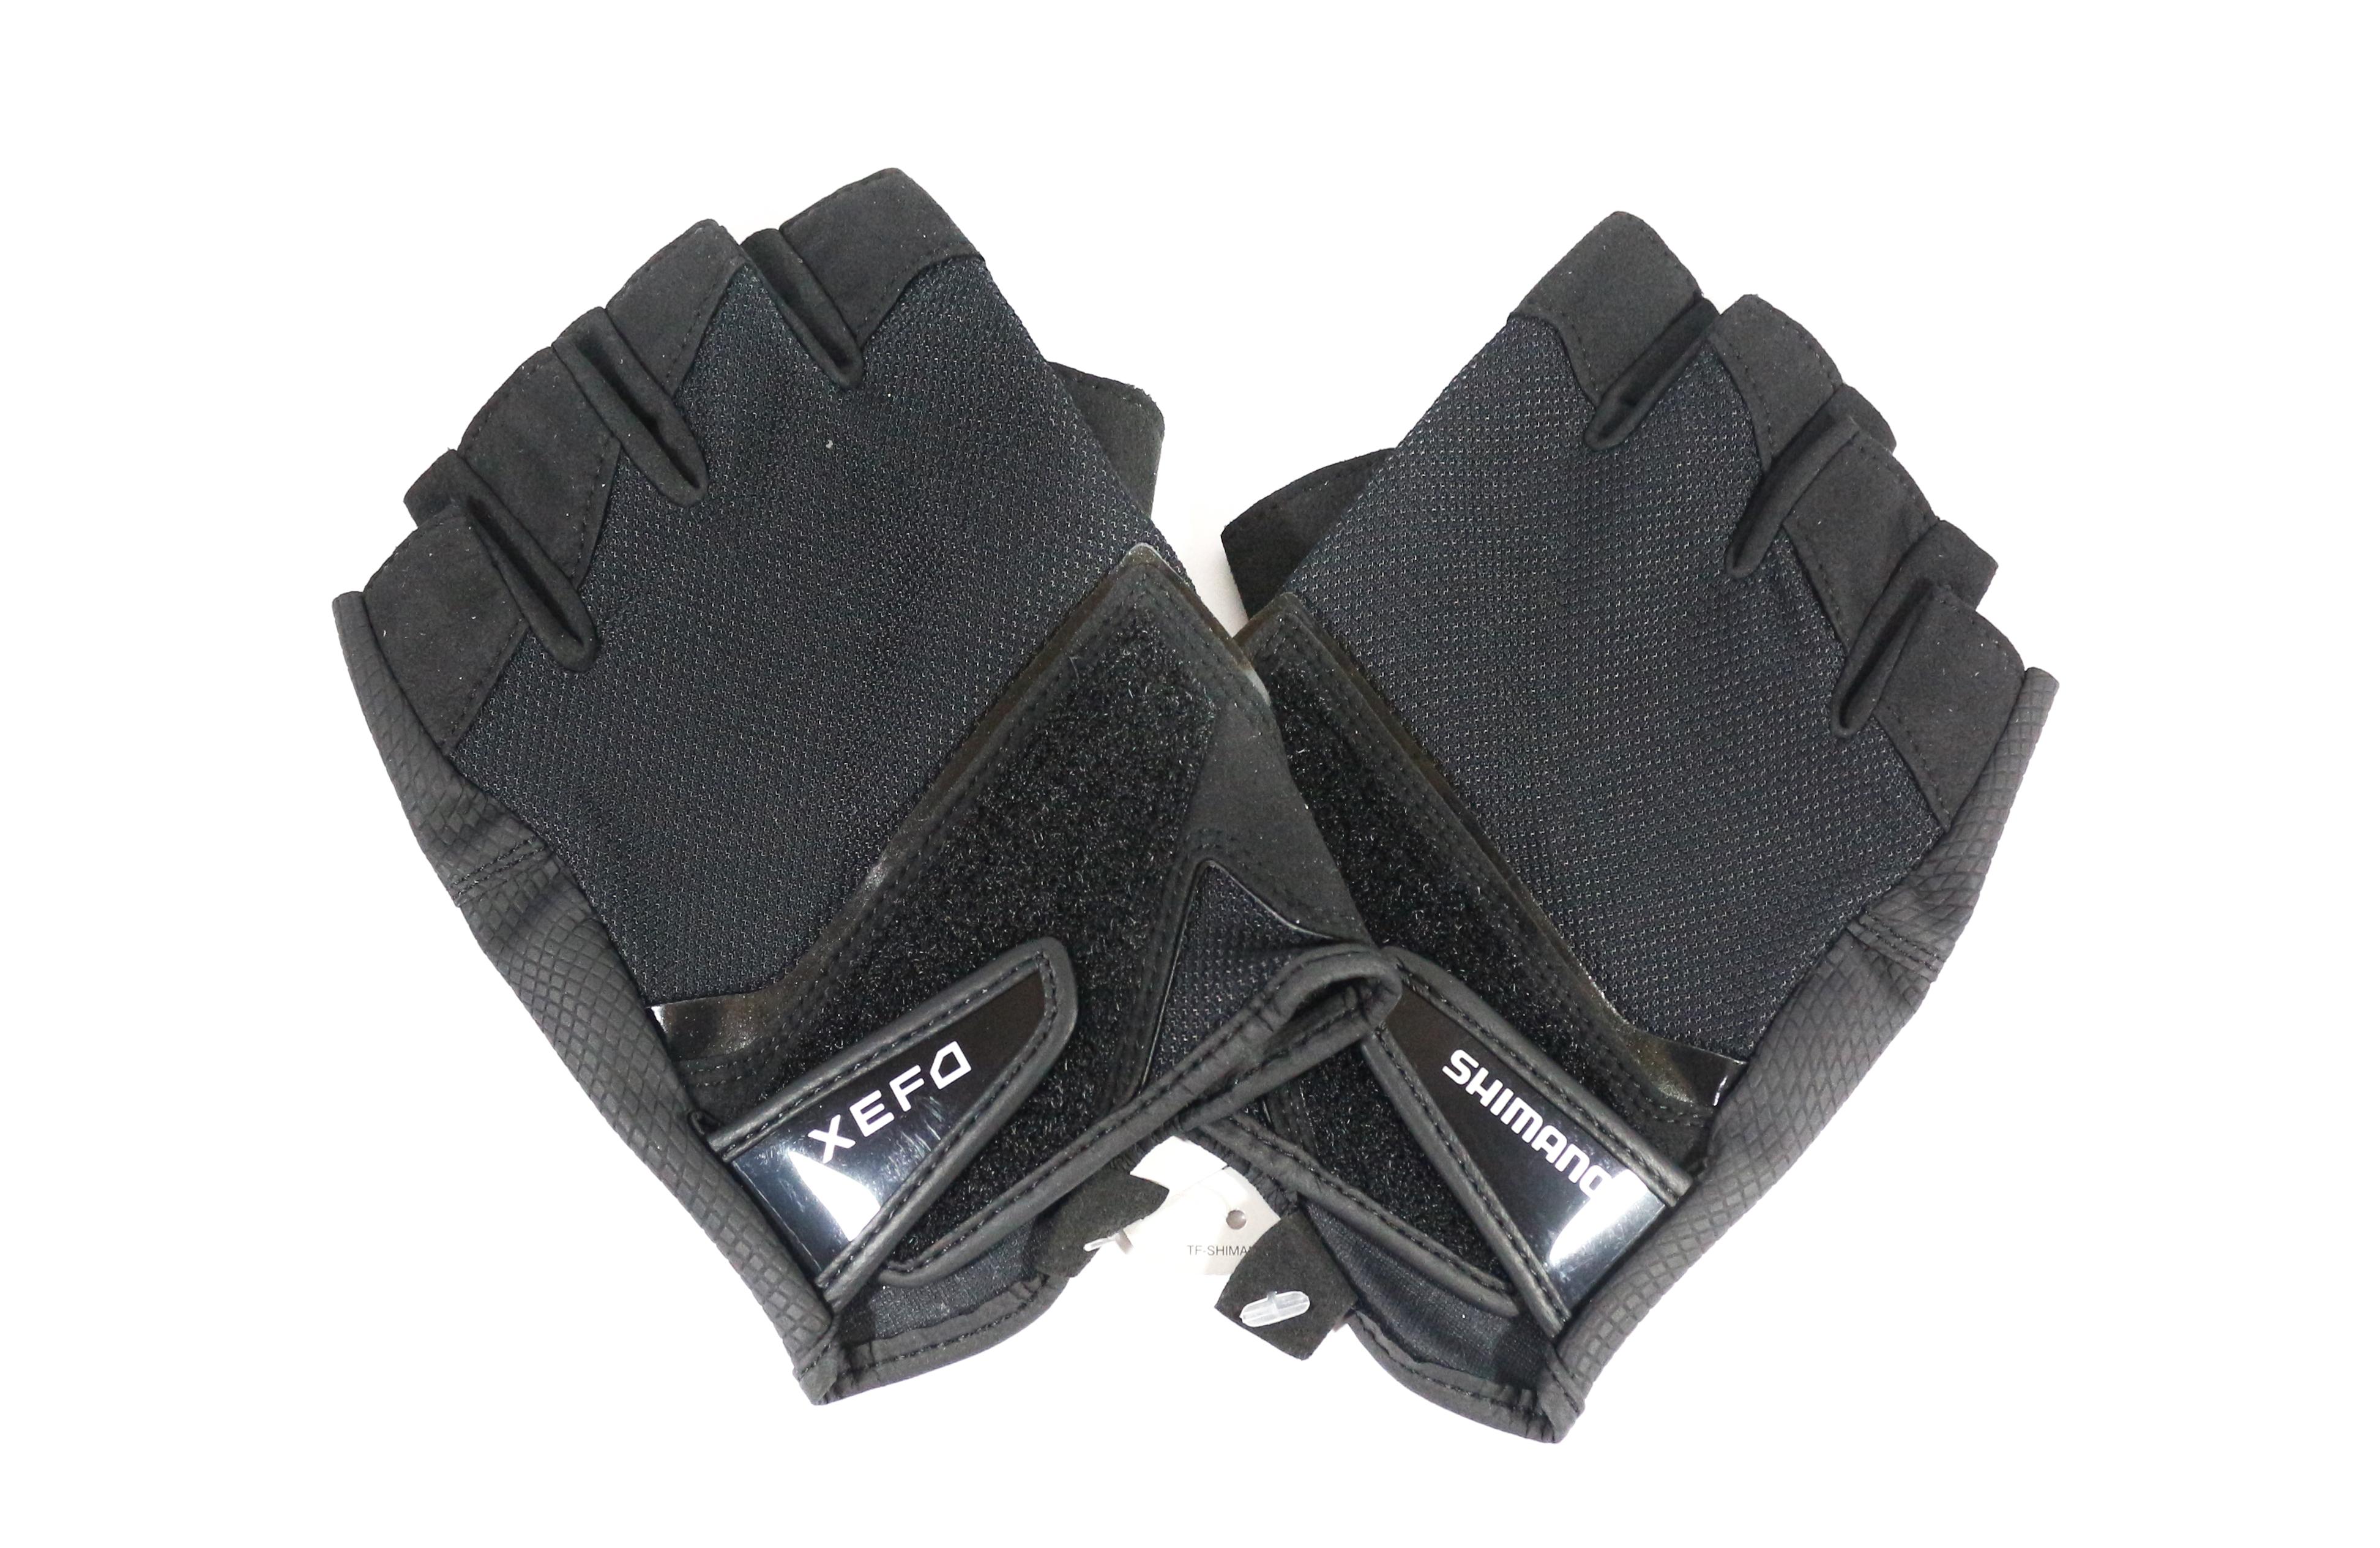 Shimano GL-242P Gloves XEFO 3D Casting 5 Fingerless Black Size M (0807)